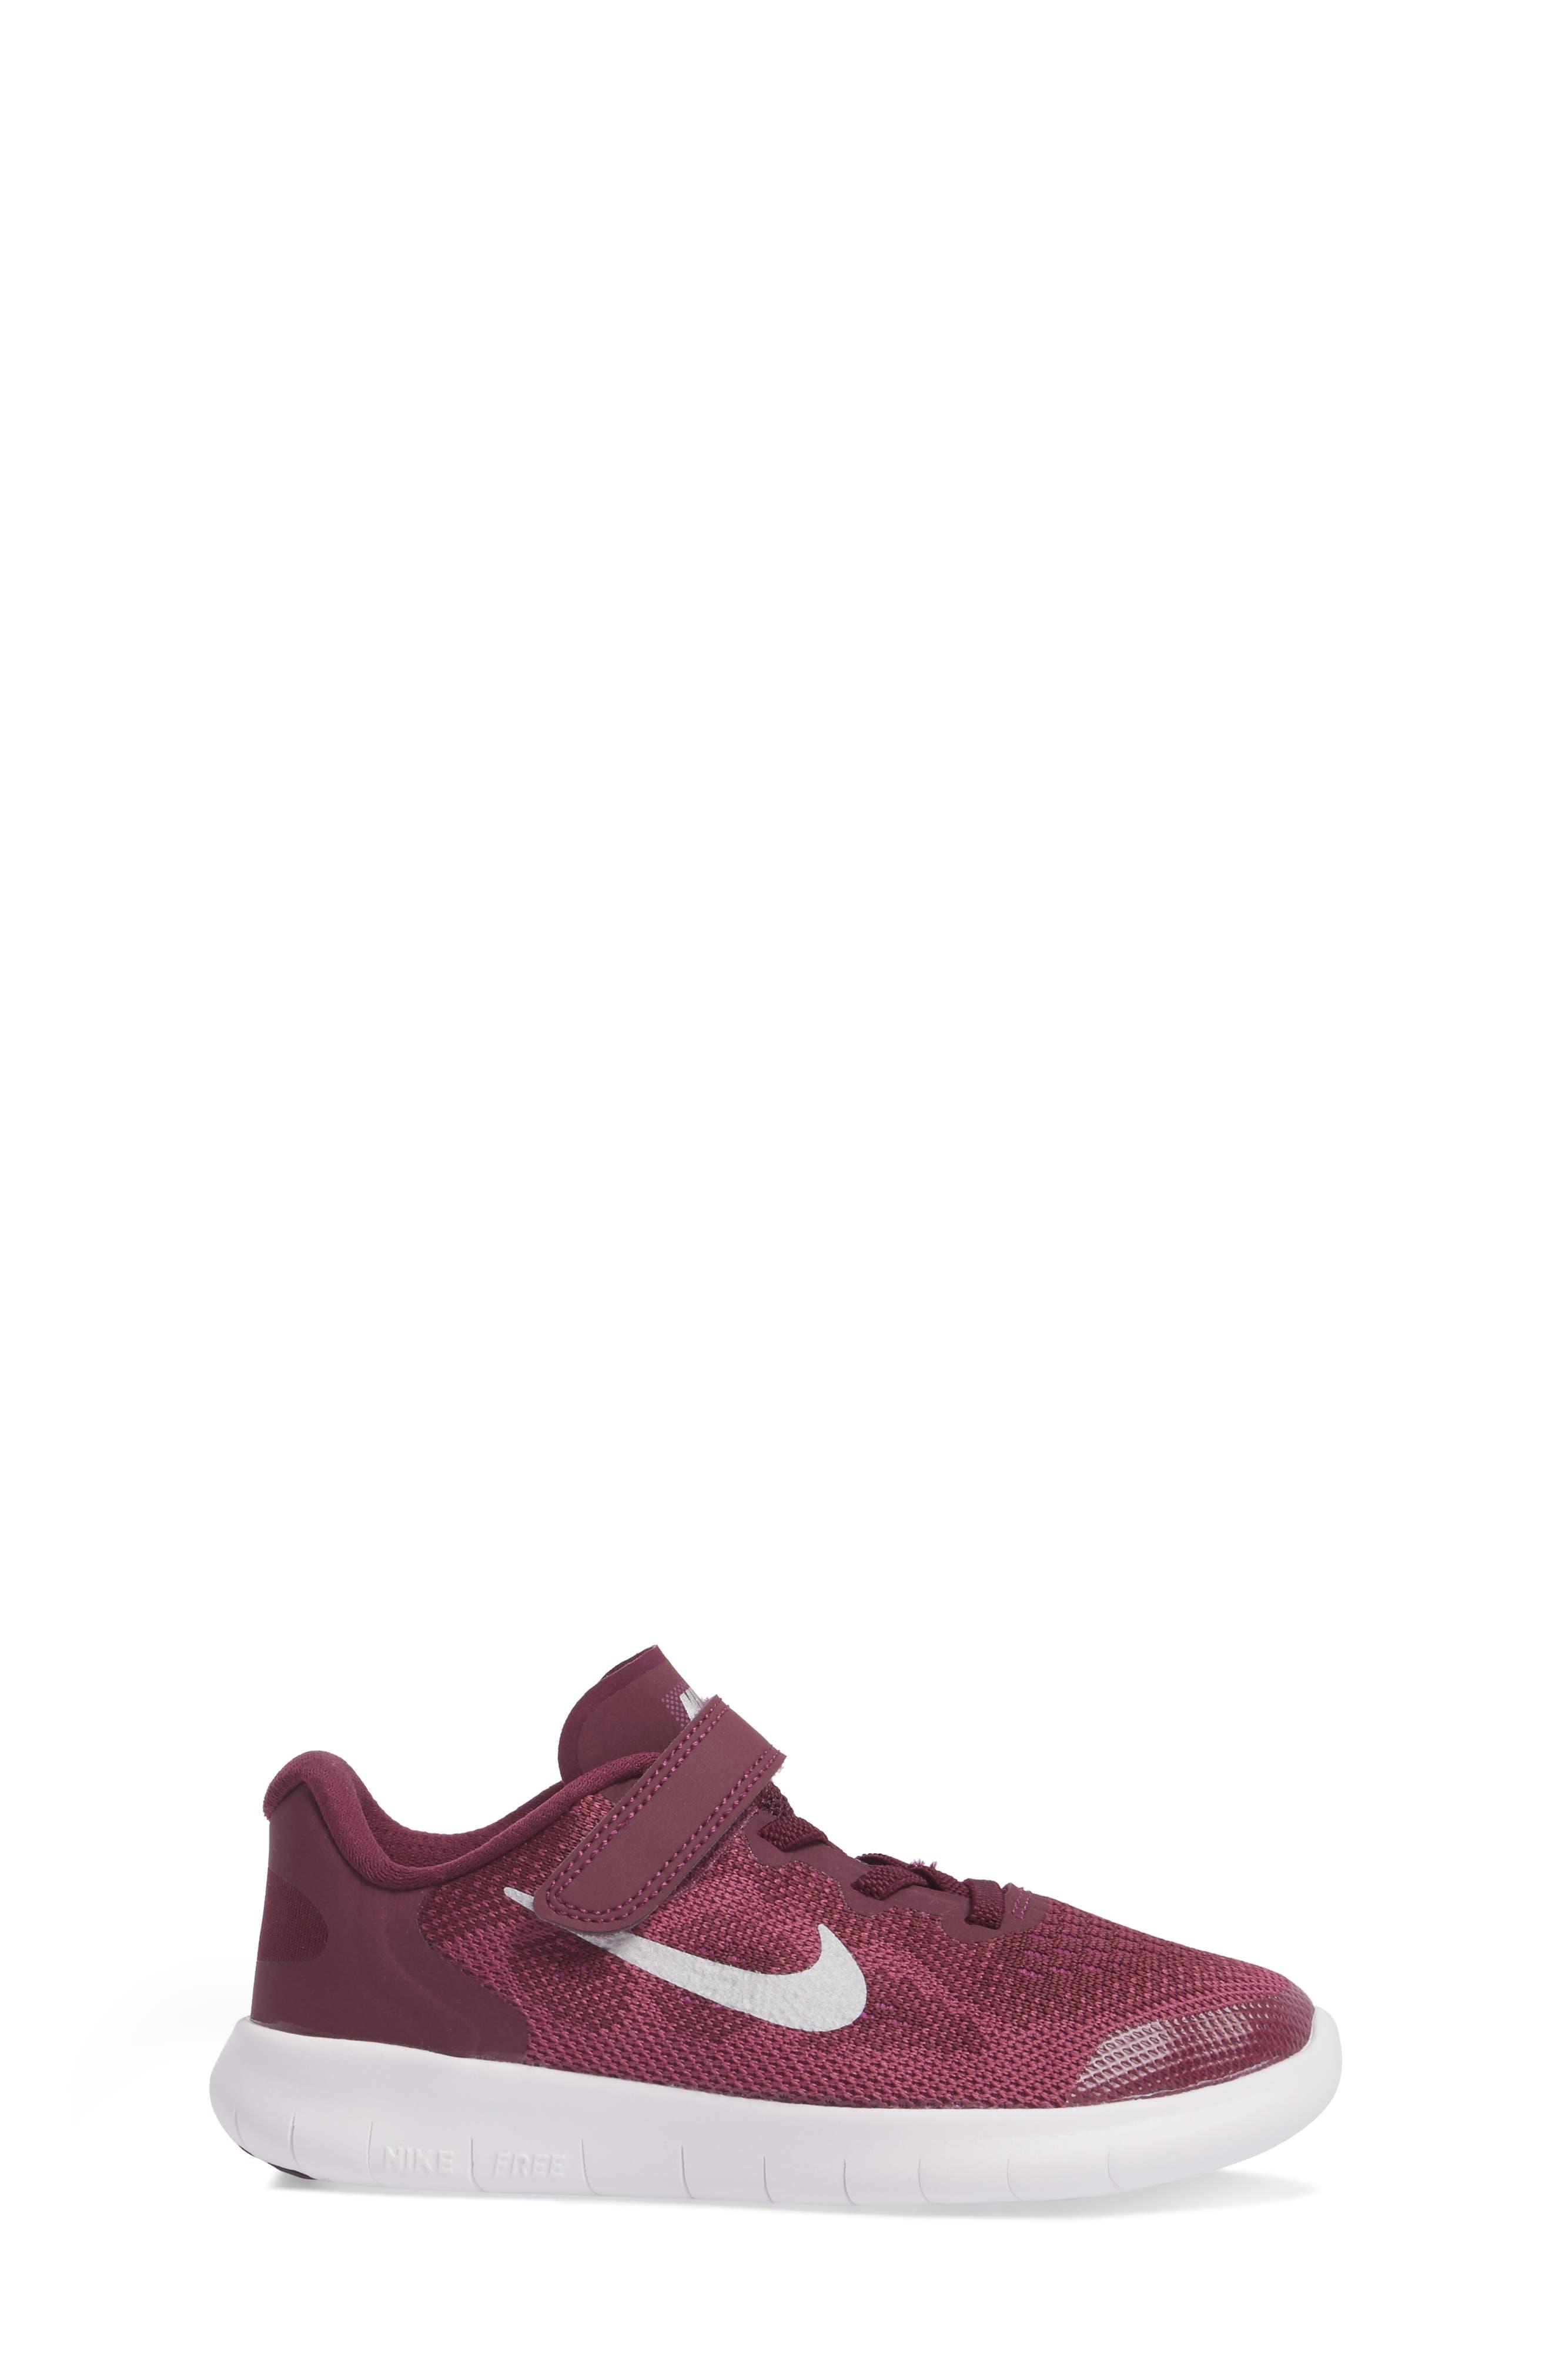 Free Run 2017 Sneaker,                             Alternate thumbnail 15, color,